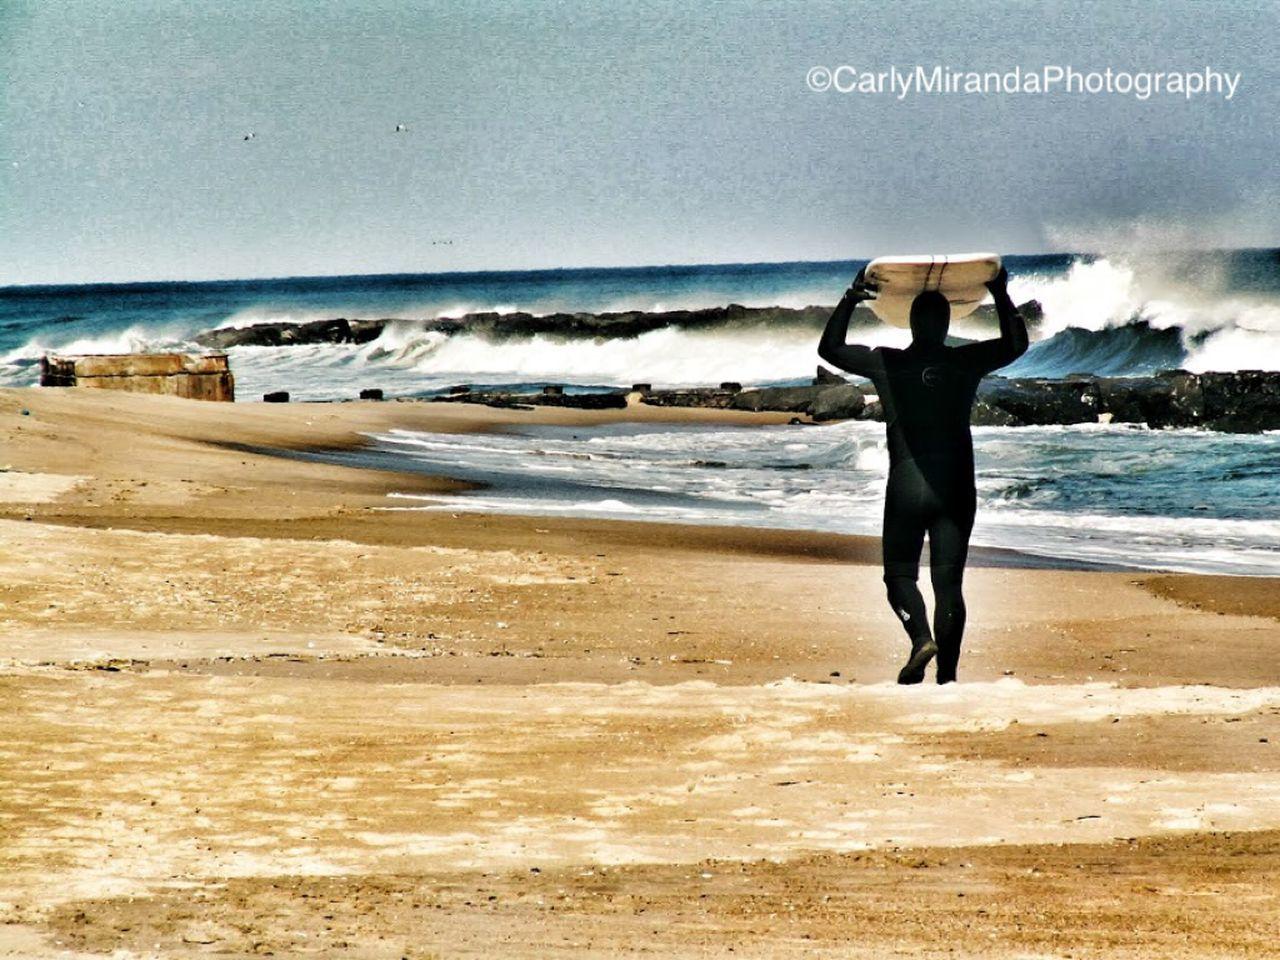 March Season  Winter Asbury Park New Jersey Asburypark Surf Surf Photography Surfing Beach Photography Beach Ocean❤ Ocean Ocean Waves Oceanside Sand People Watching People Peoplephotography First Eyeem Photo Eyem Gallery Surf's Up